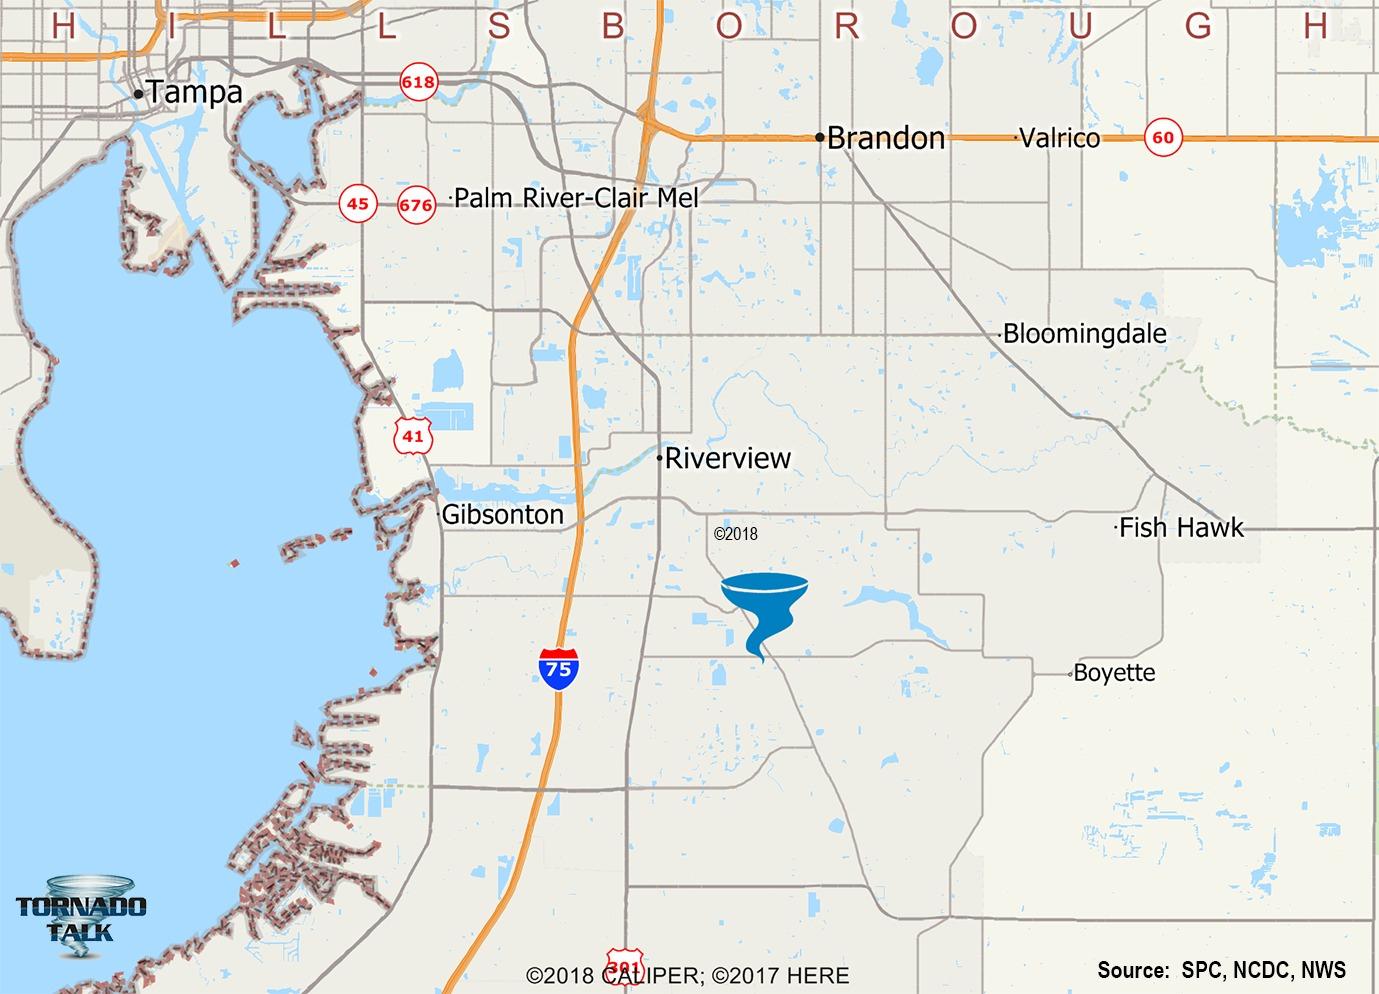 Riverview Florida Map - Riverview Florida Map